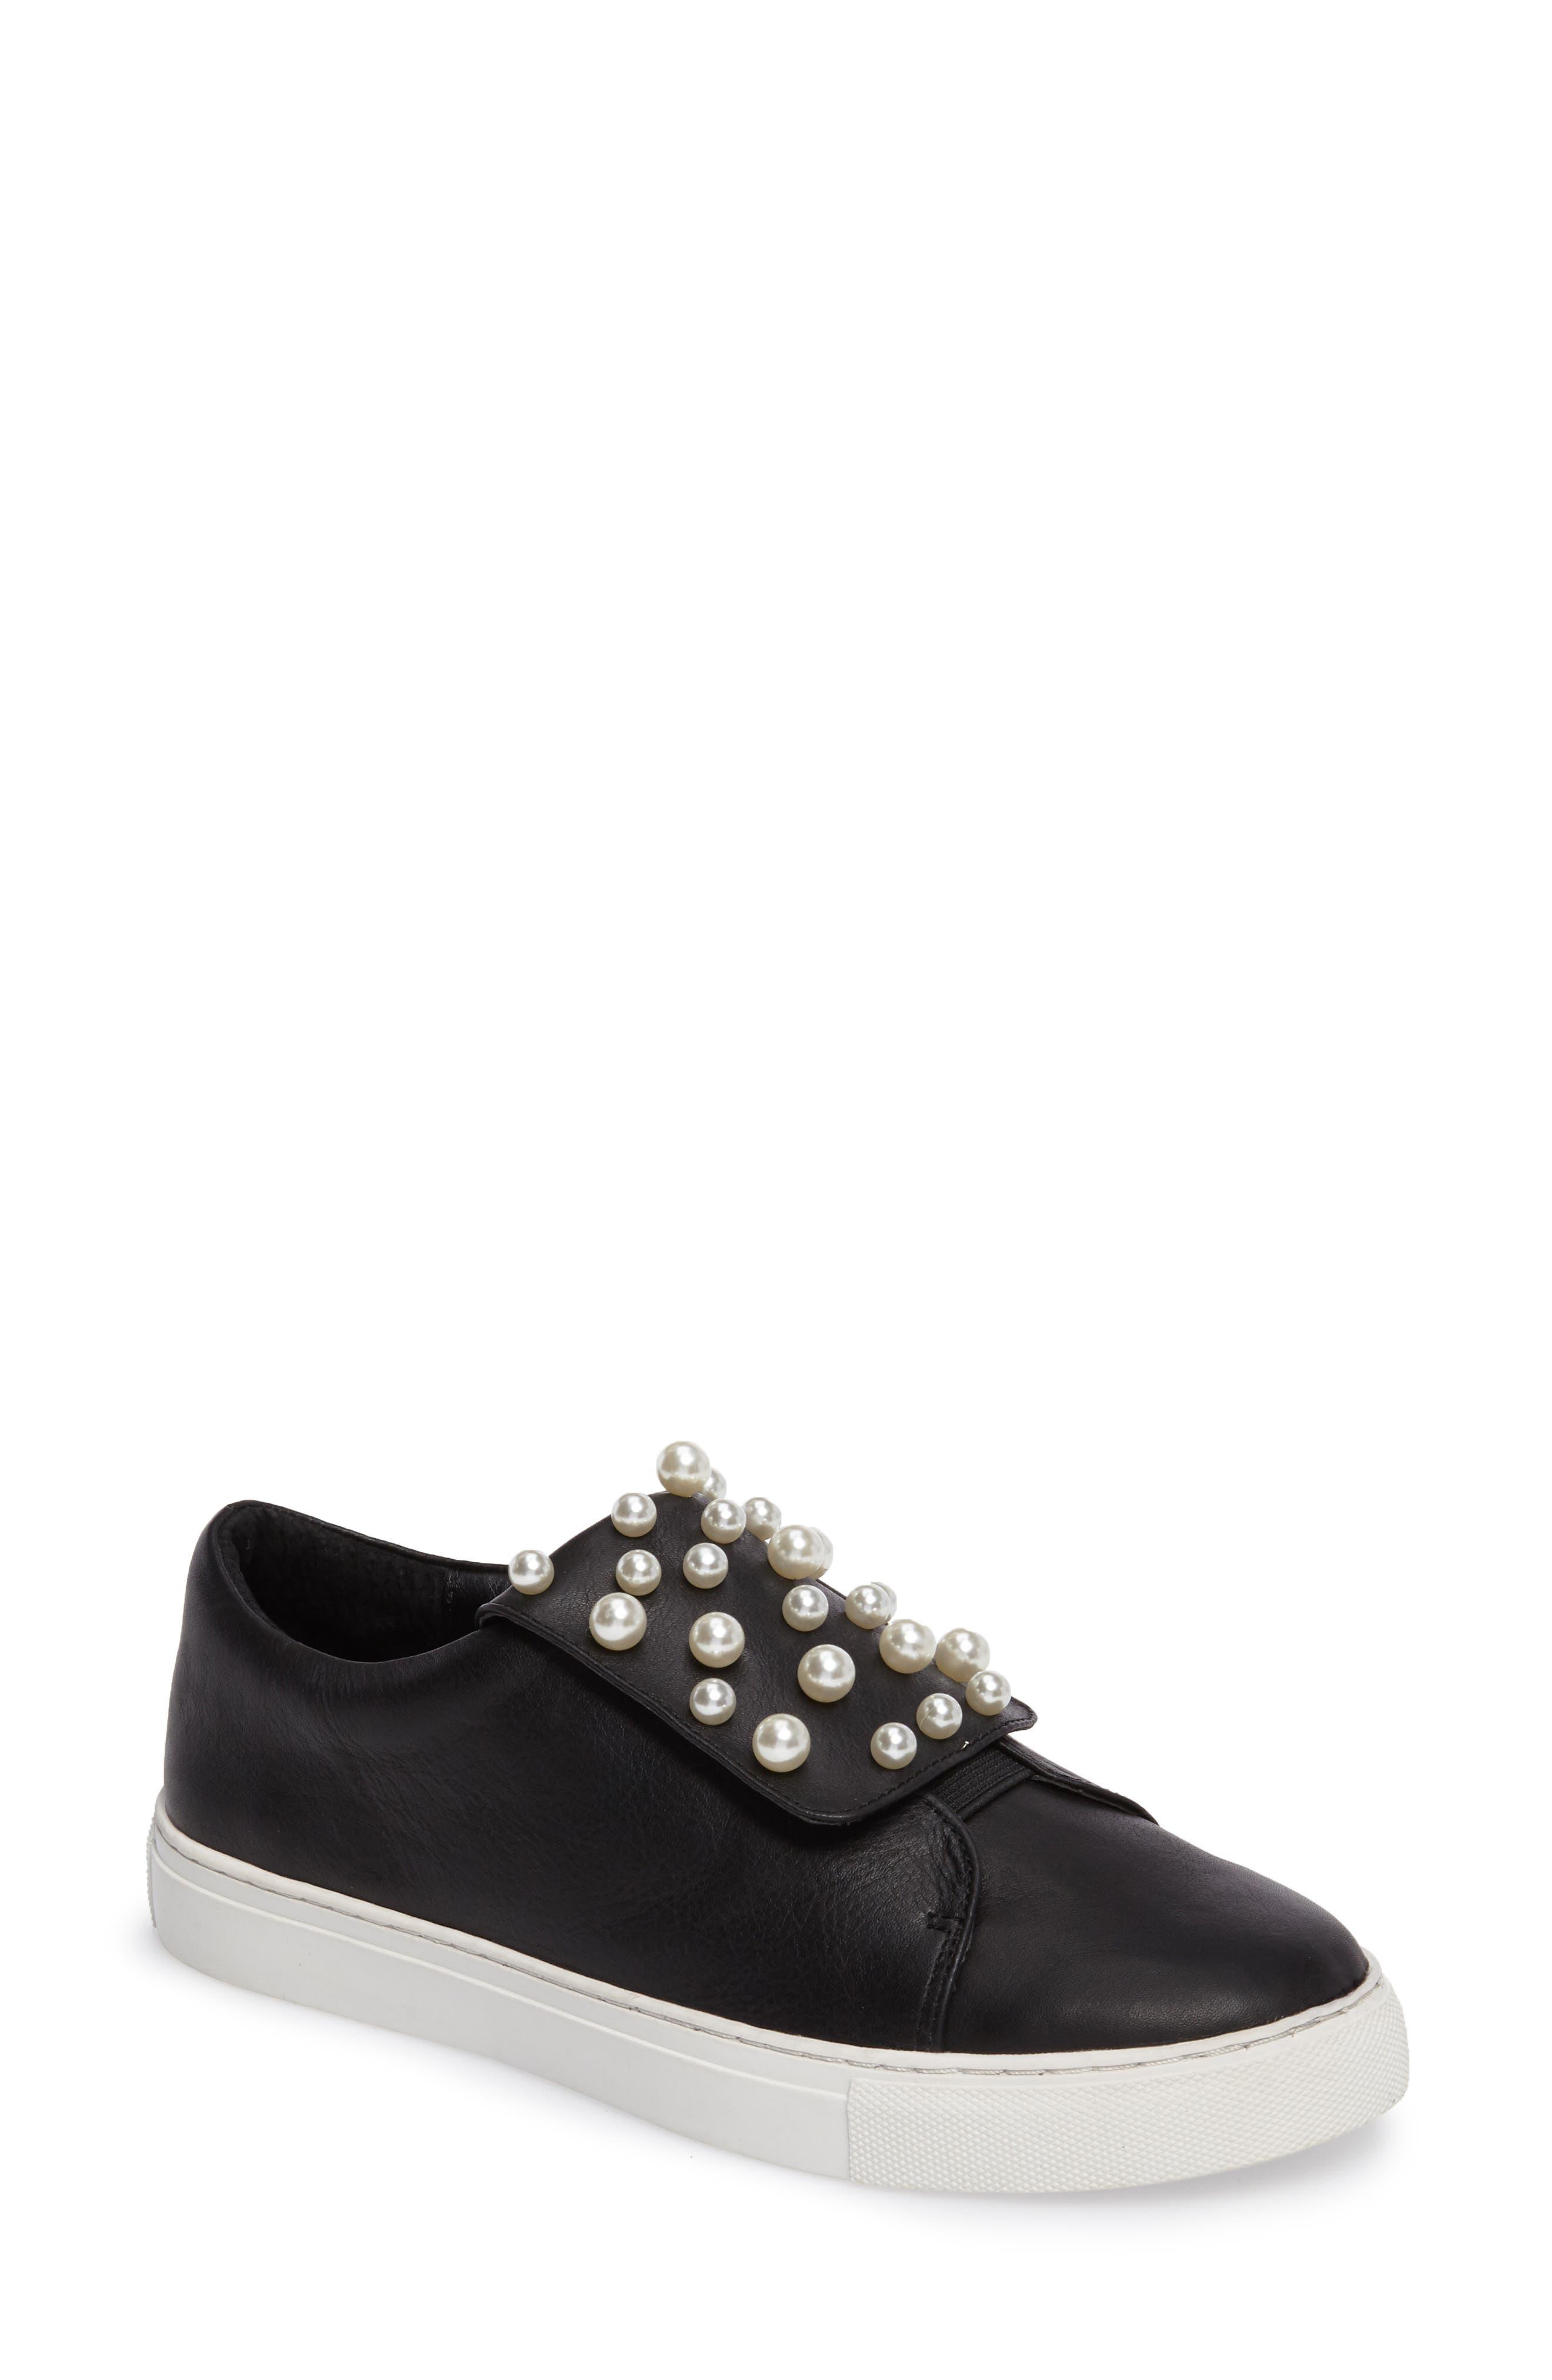 Hadi Imitation Pearl Embellished Platorm Sneaker,                             Main thumbnail 1, color,                             001